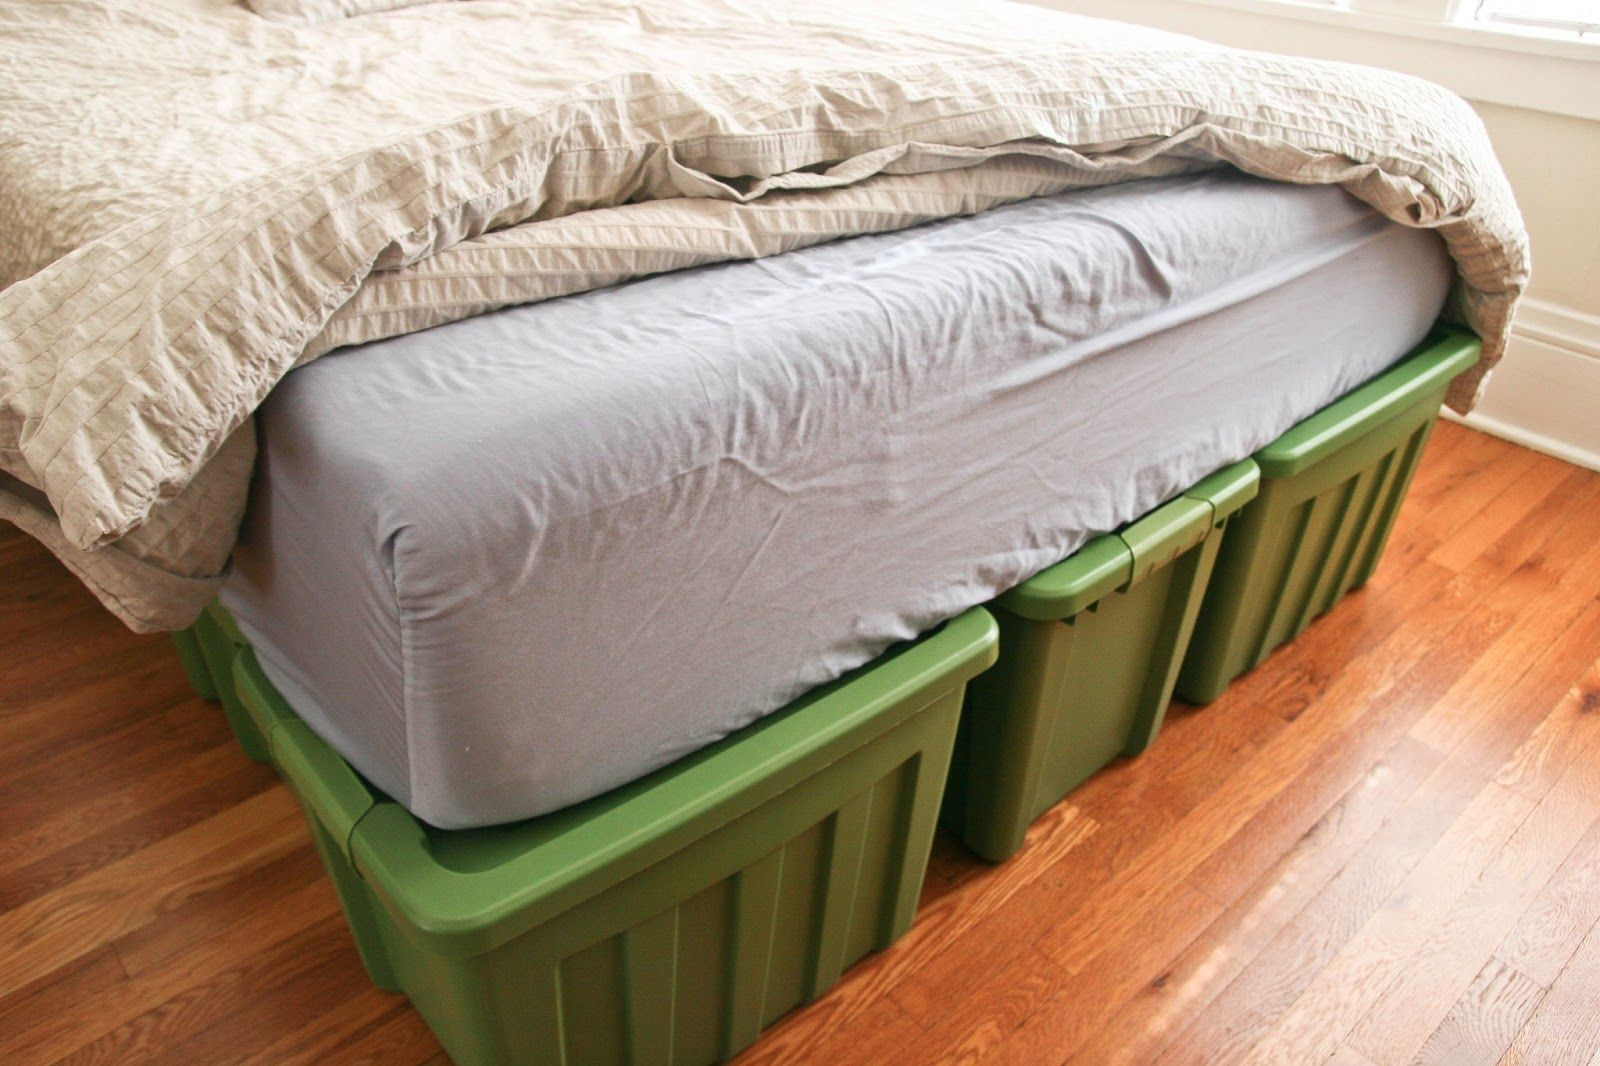 Diy Bed Frame Storage Faaljfm1 Bed Ideas Pinterest